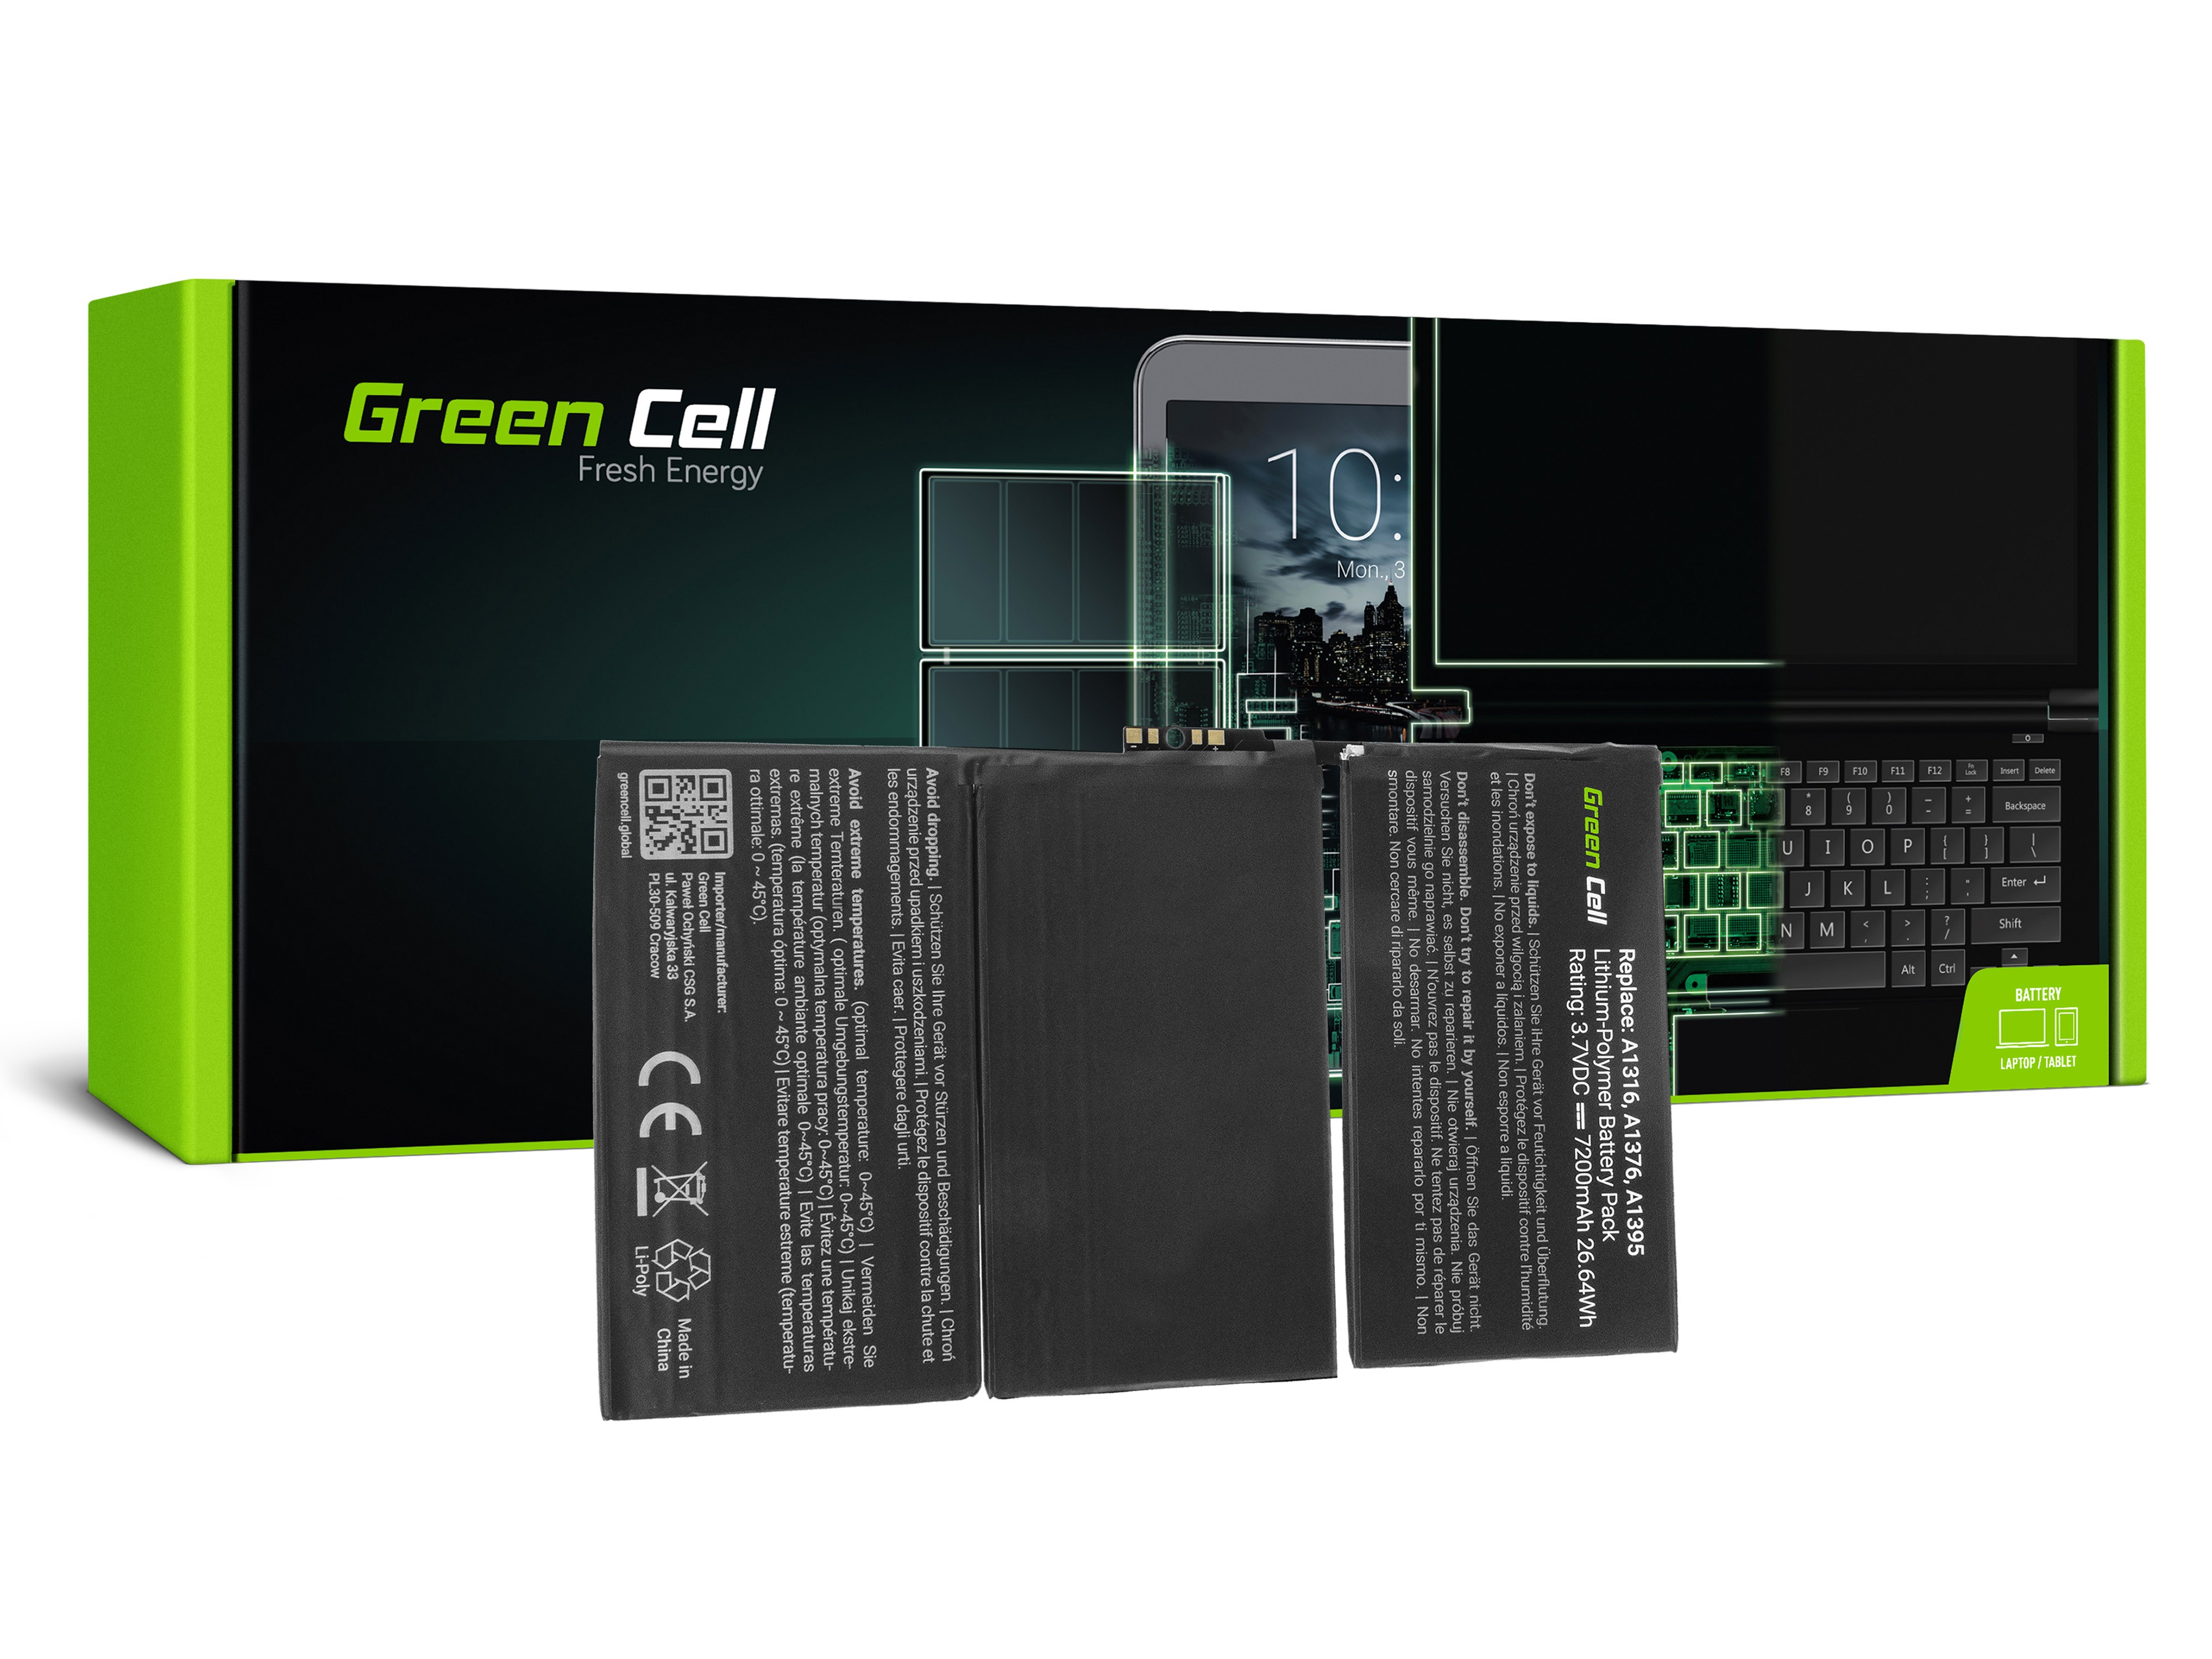 Batteri av Green Cellsurfplatta A1376 Apple iPad 2 A1395 A1396 A1397